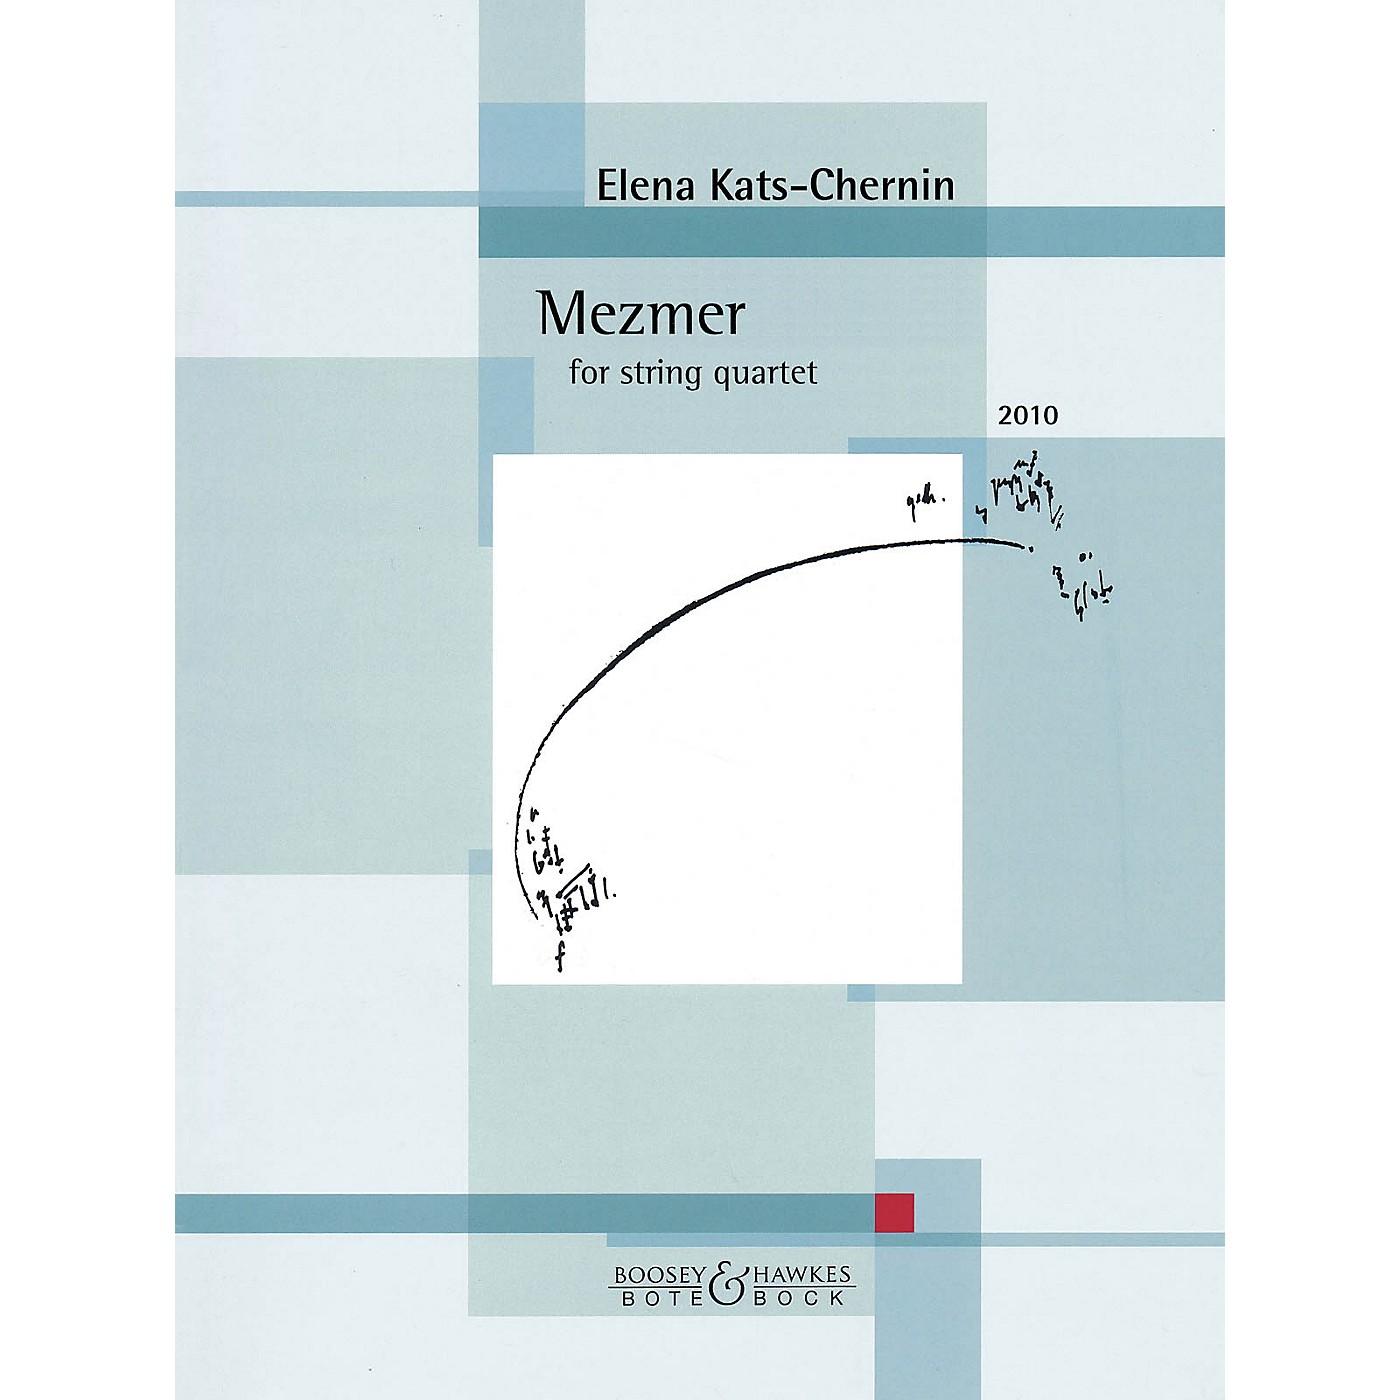 Bote & Bock Mezmer (2010) (for String Quartet) Boosey & Hawkes Chamber Music Series Softcover by Elena Kats-Chernin thumbnail